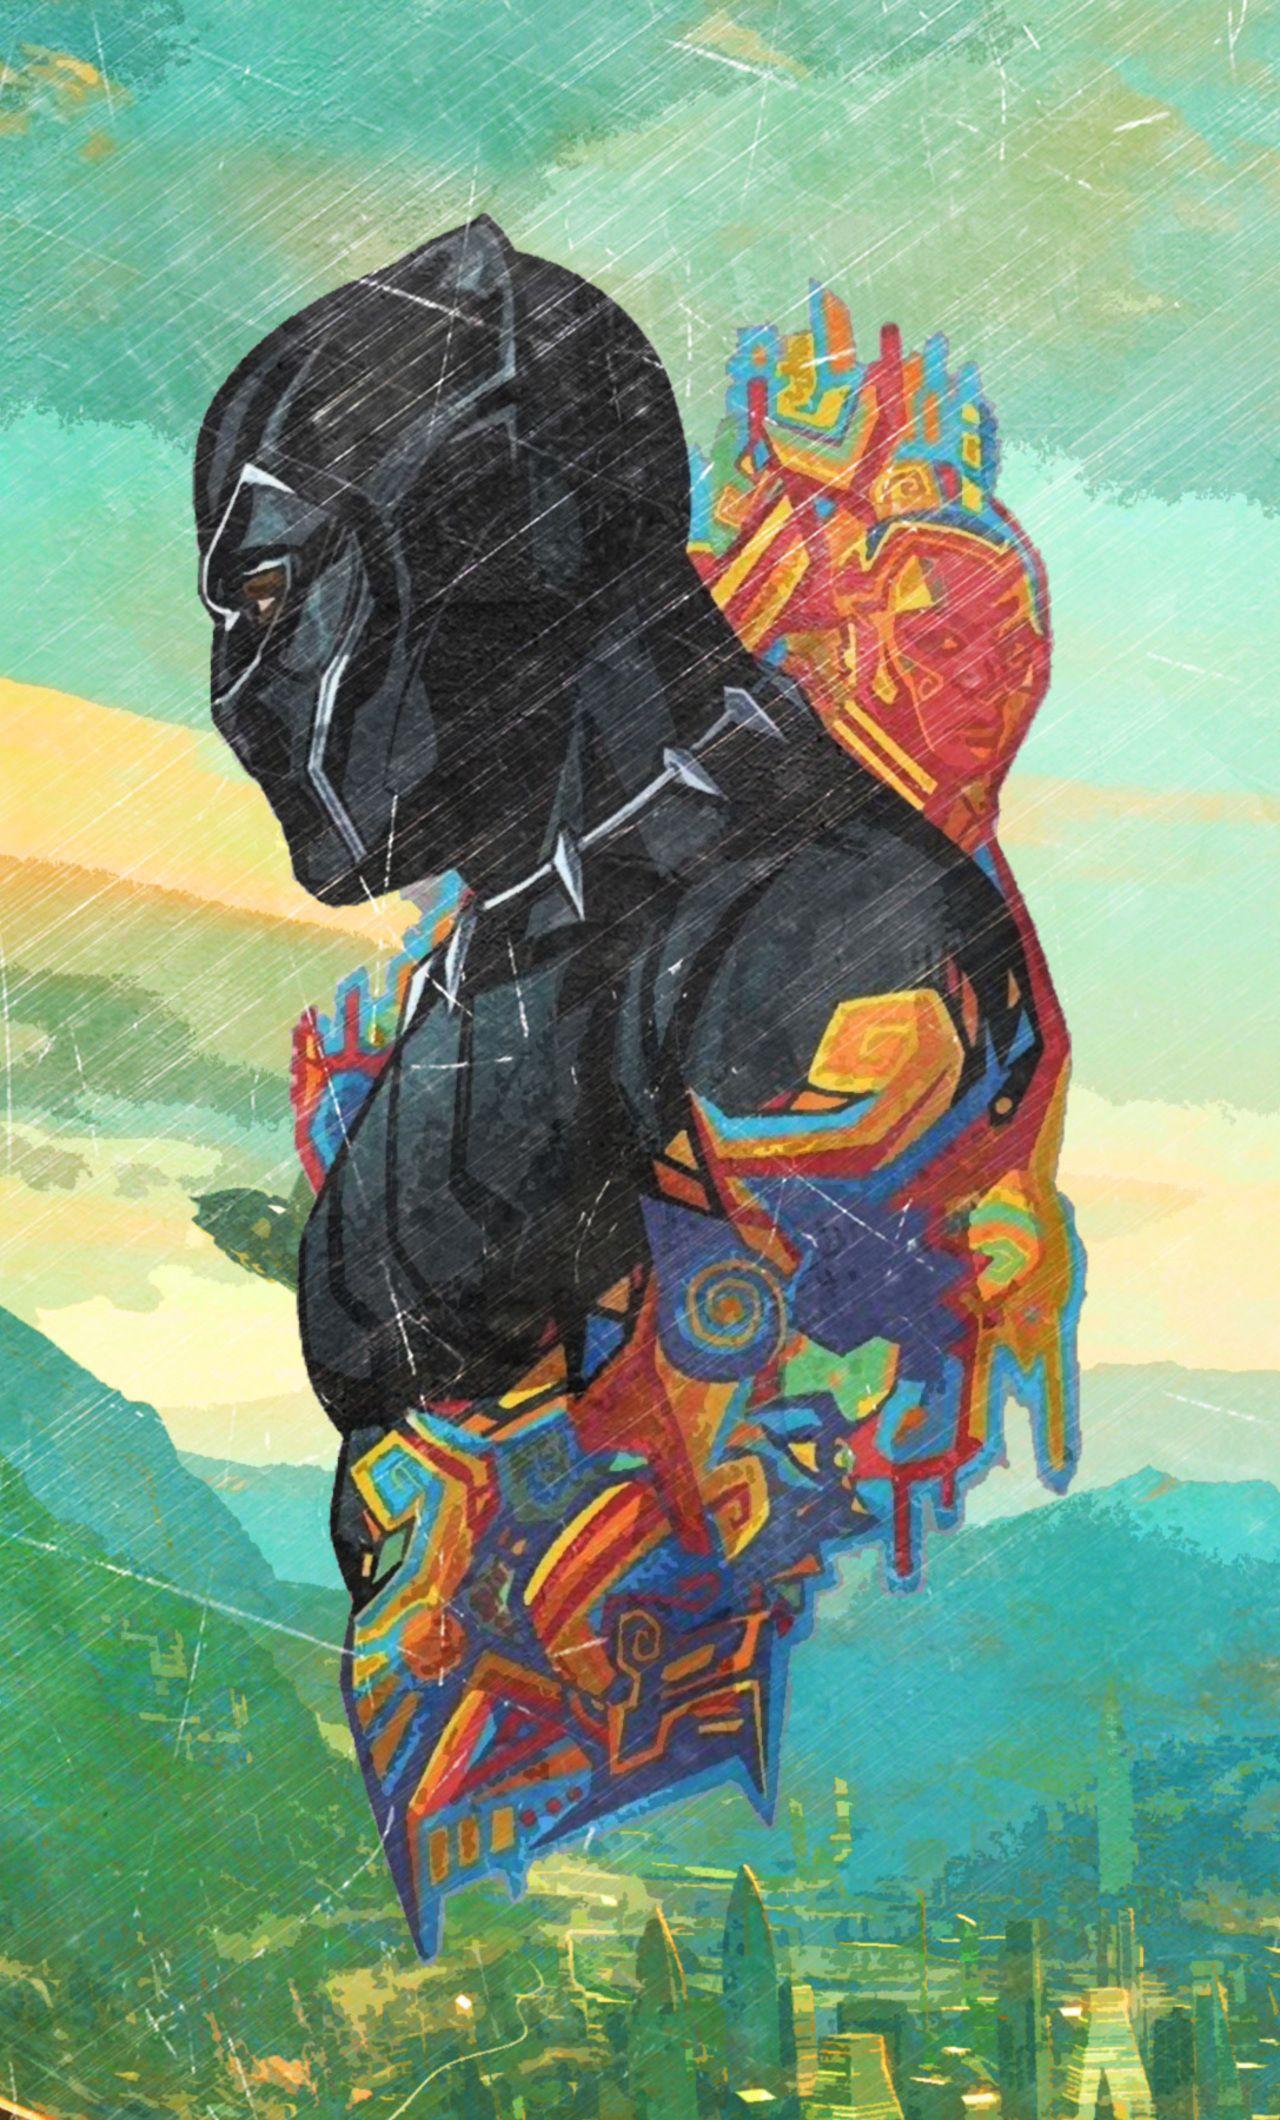 1280x2120 Black Panther Promo Art Iphone 6 Hd 4k Wallpapers Black Panther Marvel Black Panther Superhero Superhero Wallpaper